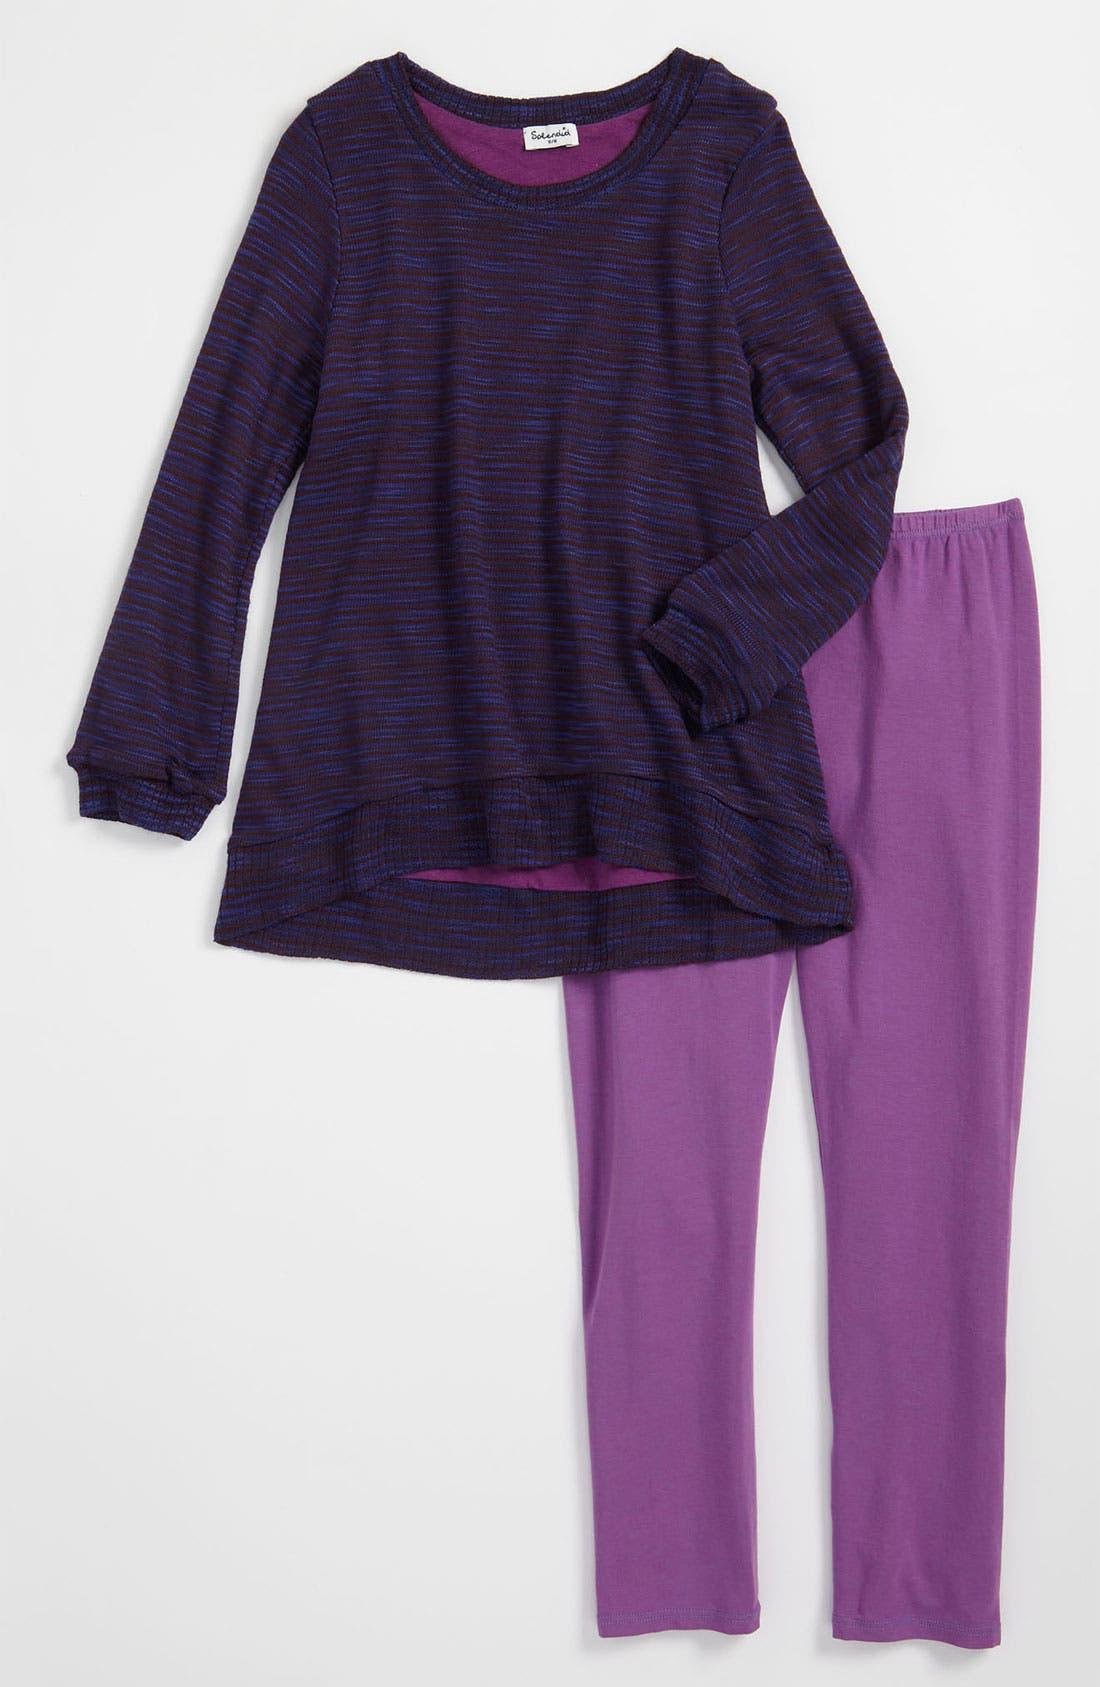 Main Image - Splendid 'Feathery' Knit Tunic & Leggings (Little Girls)